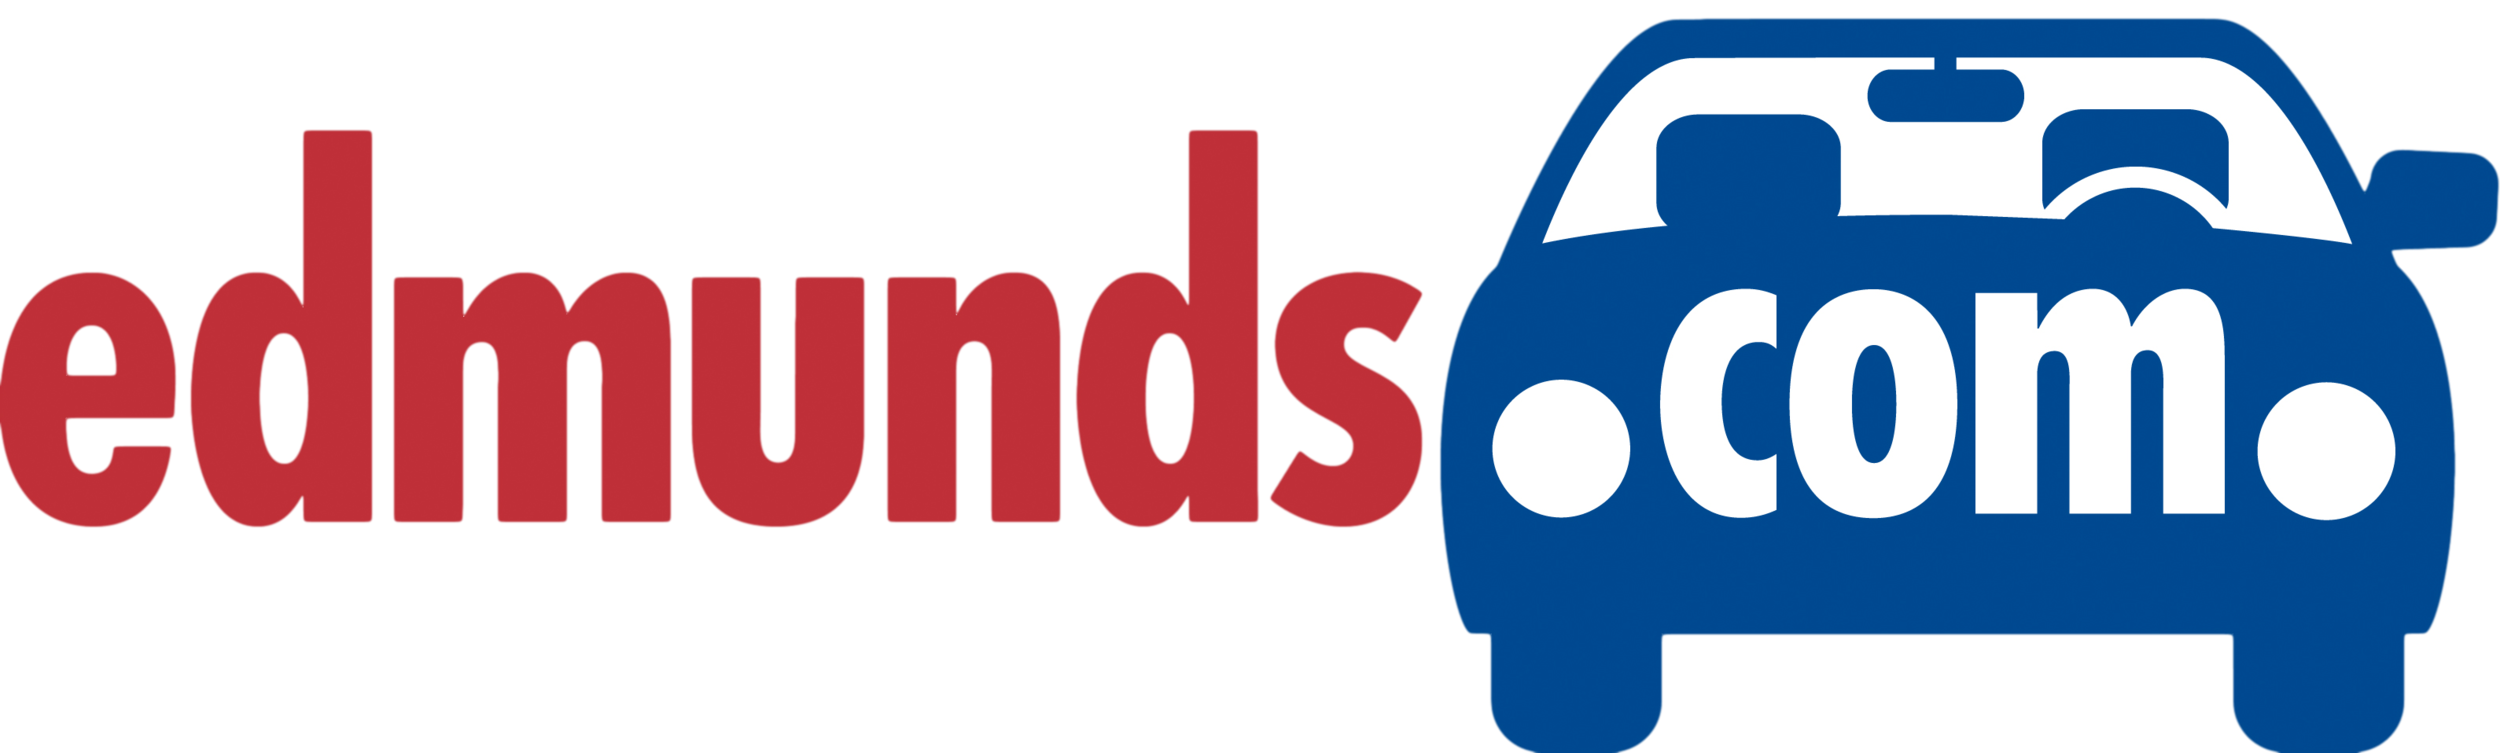 edmunds.png